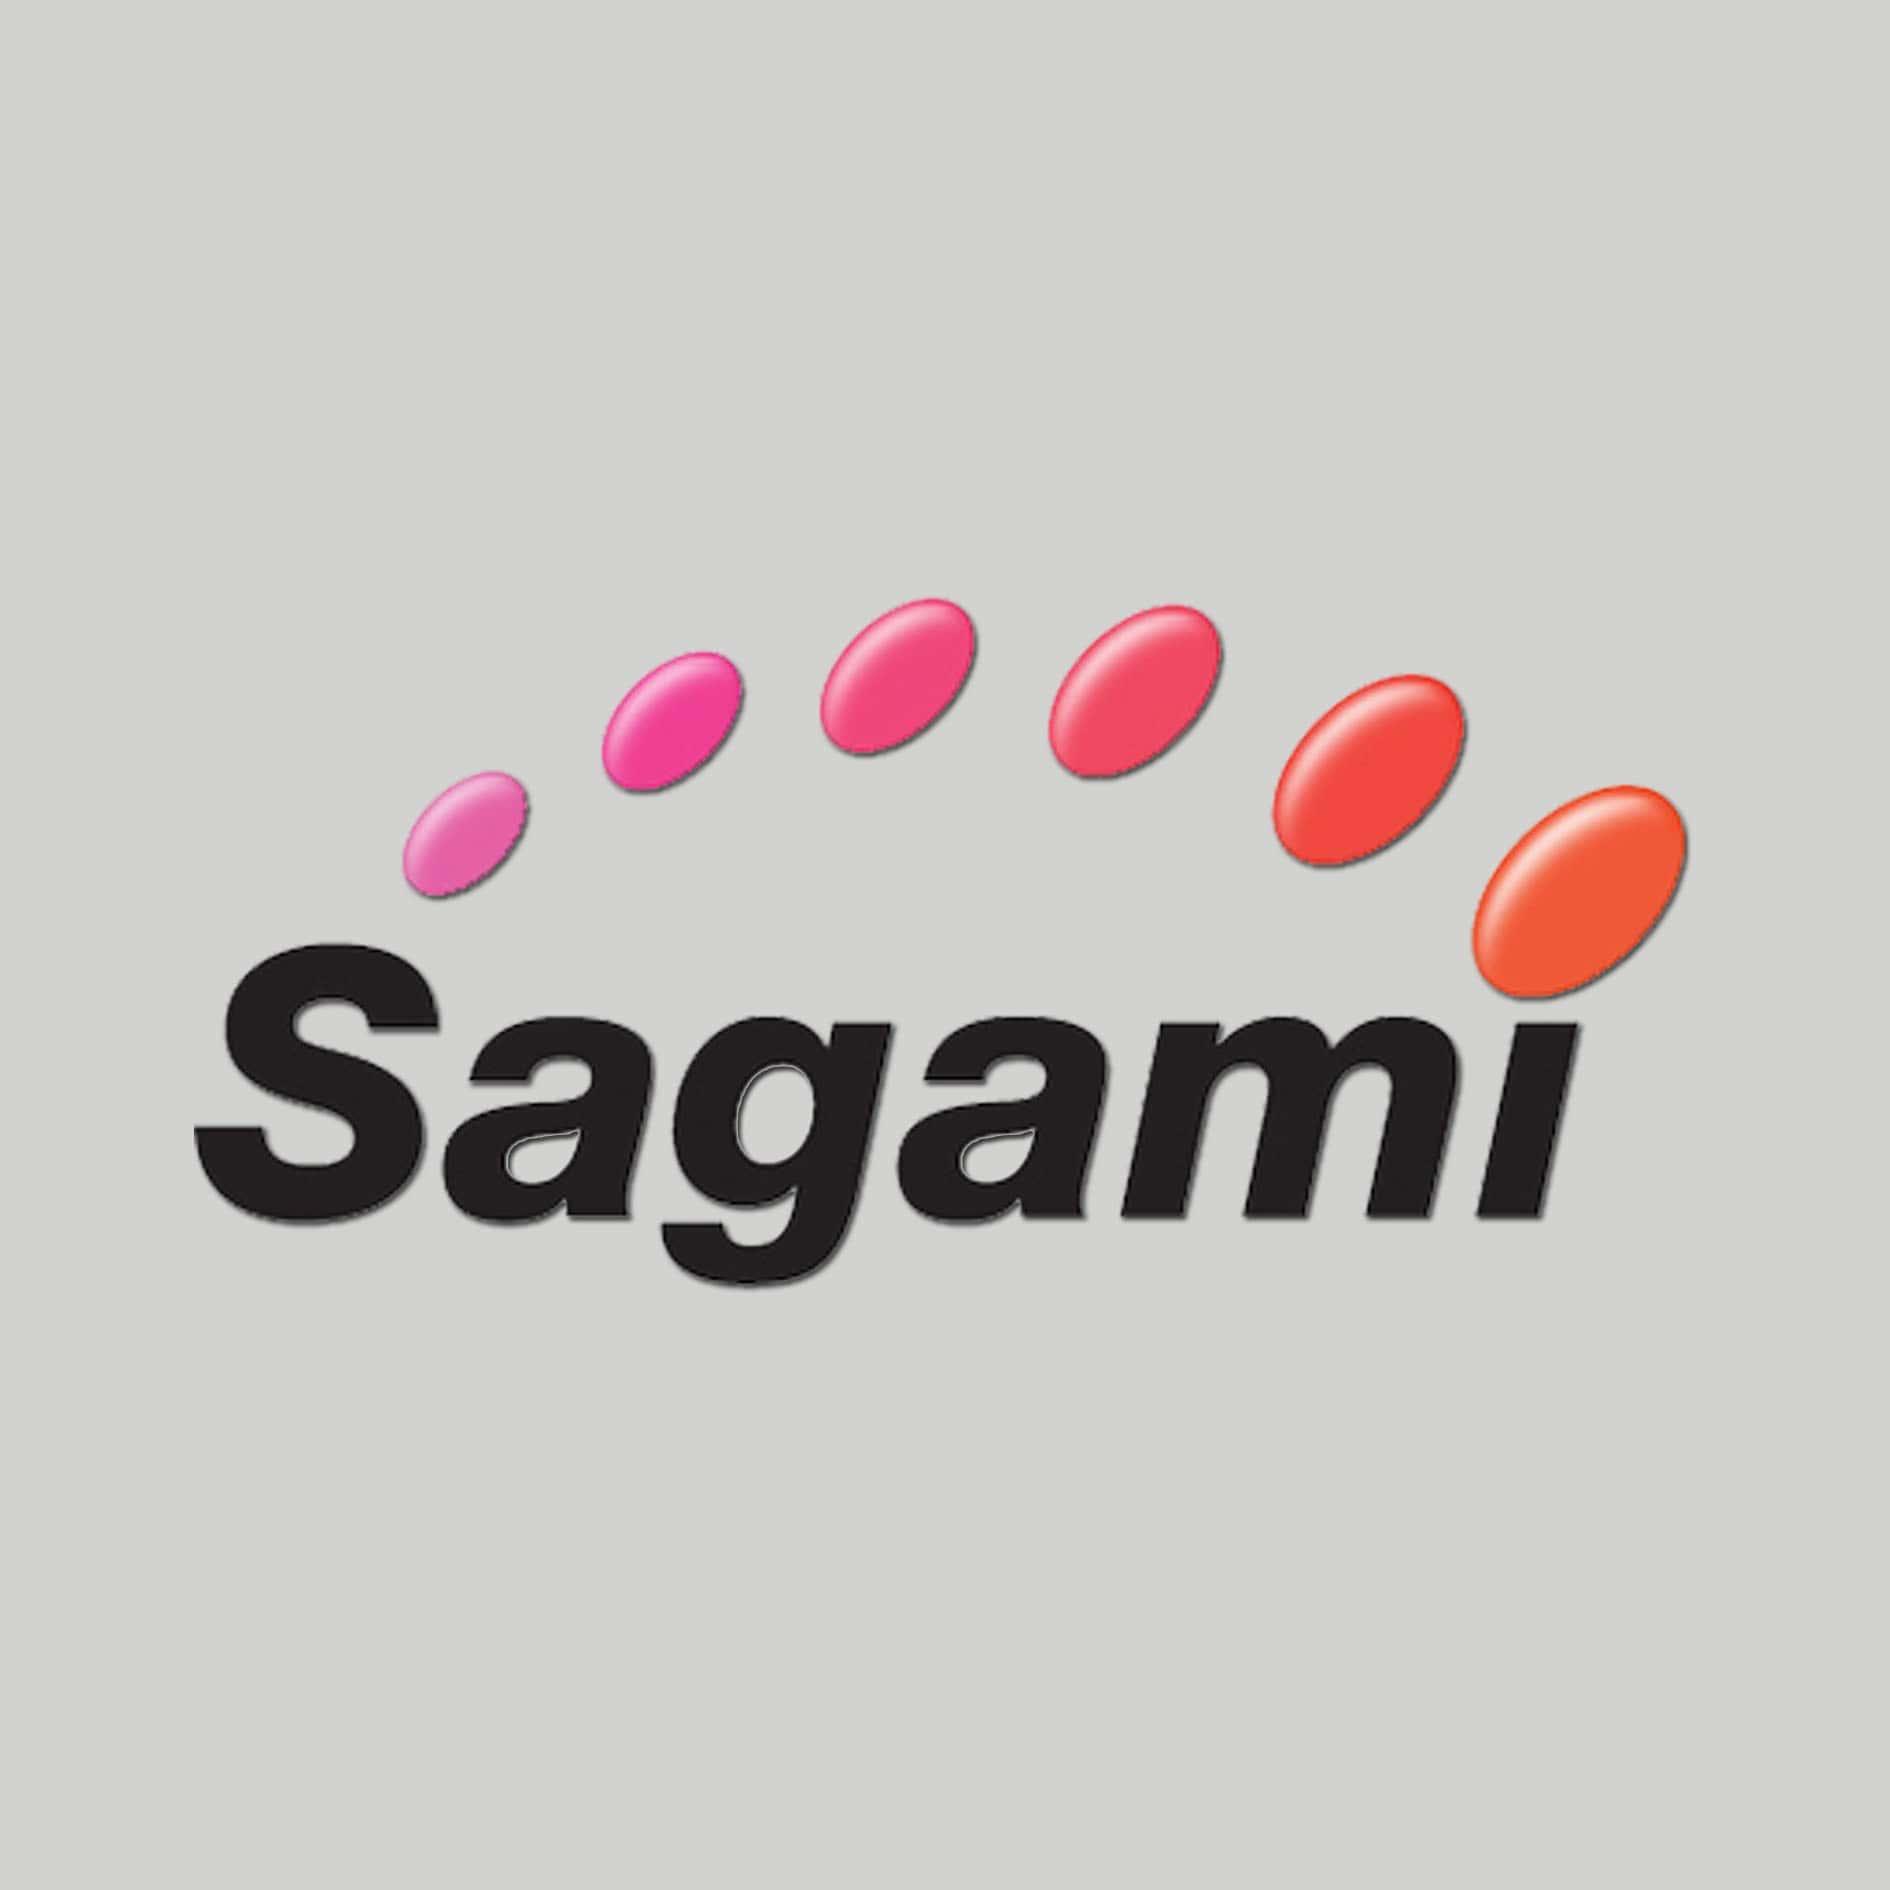 sagami original